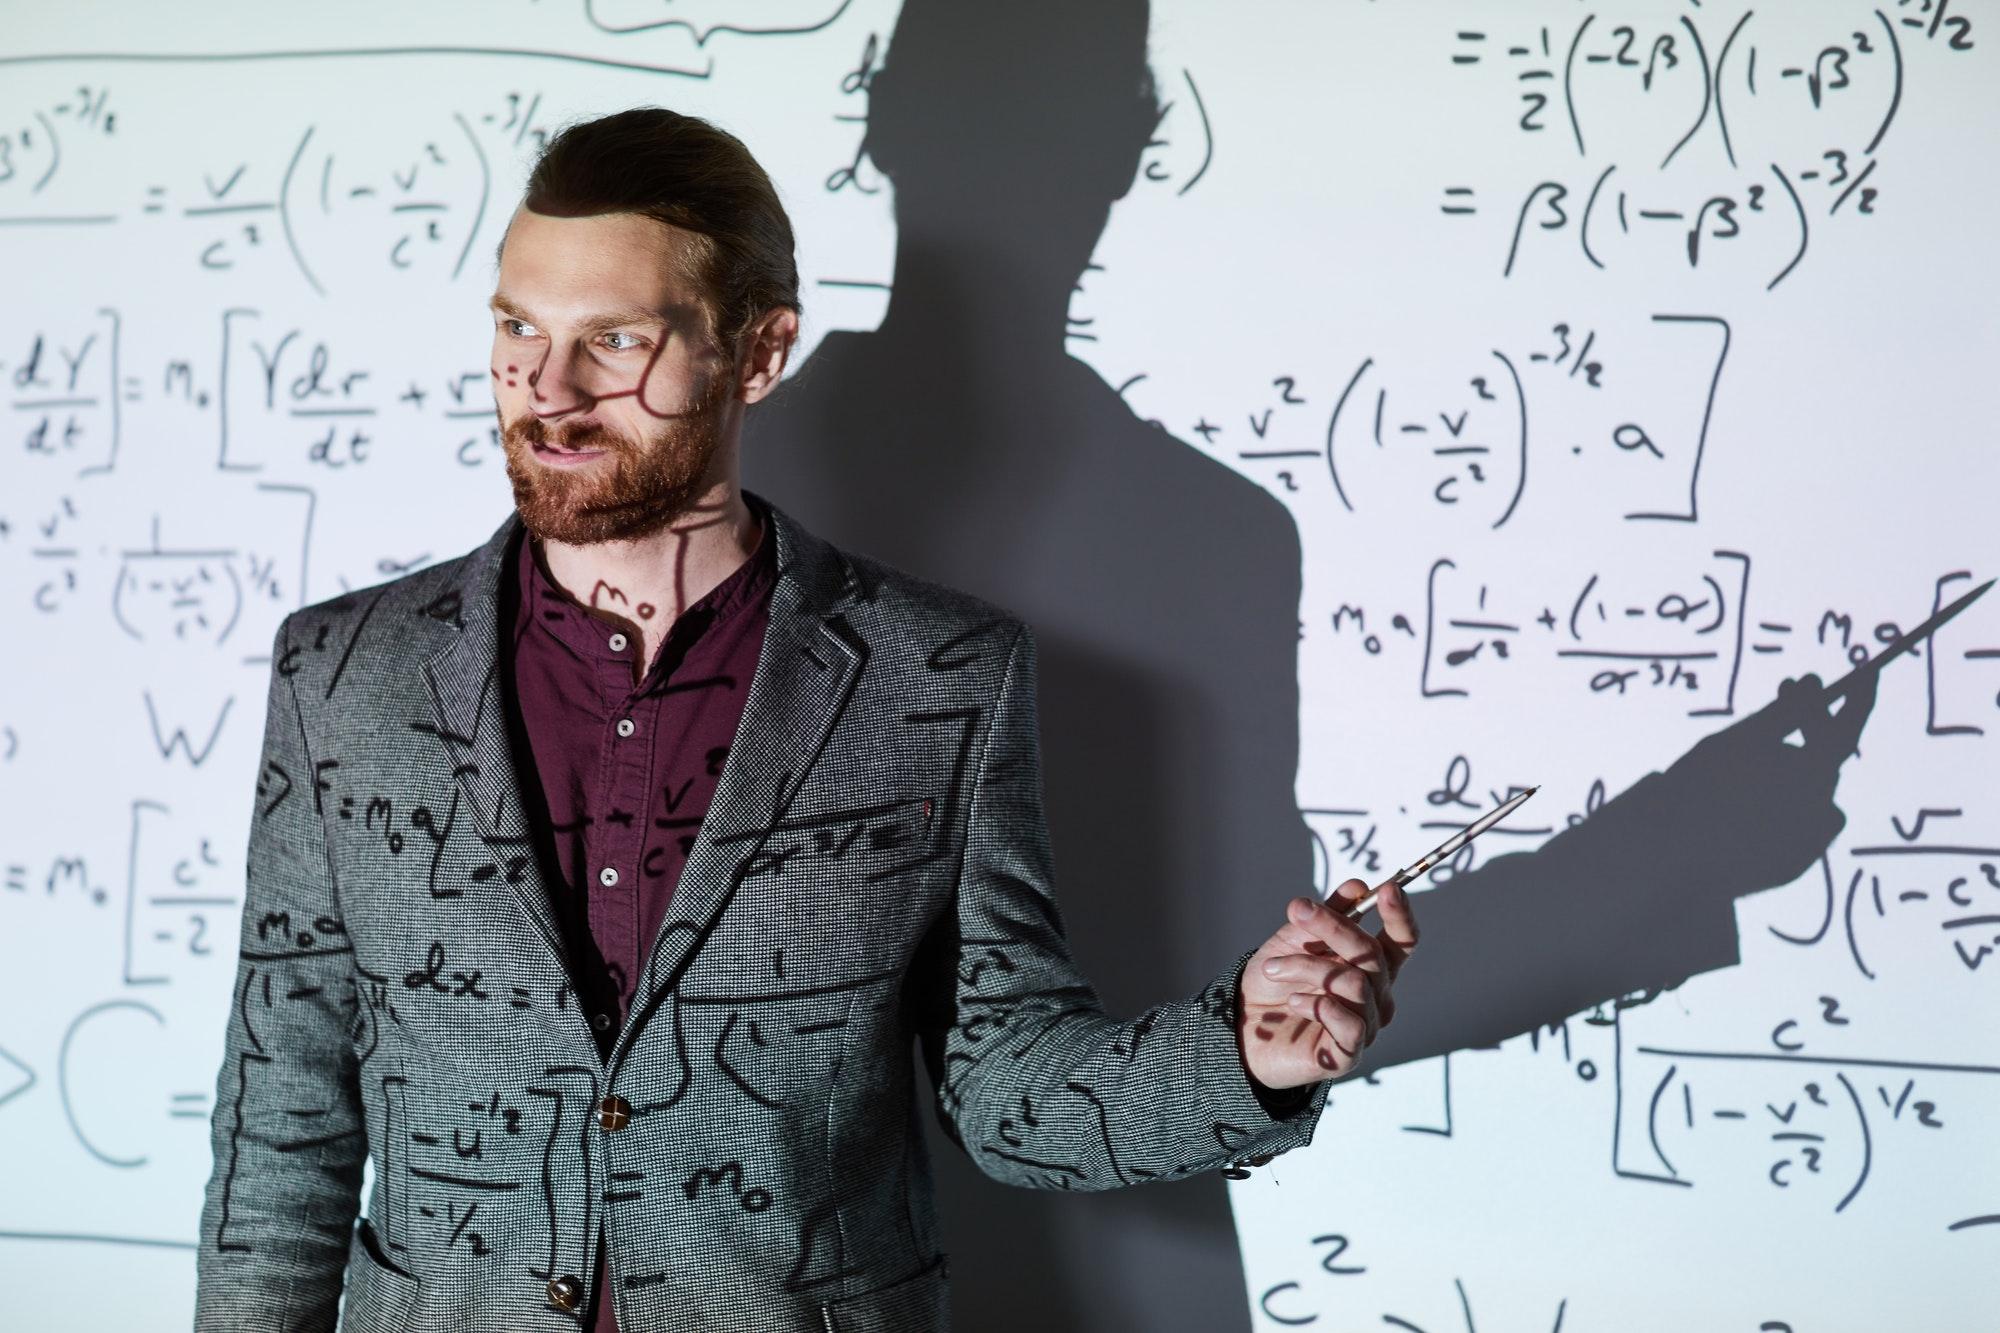 Math teacher explaining calculations